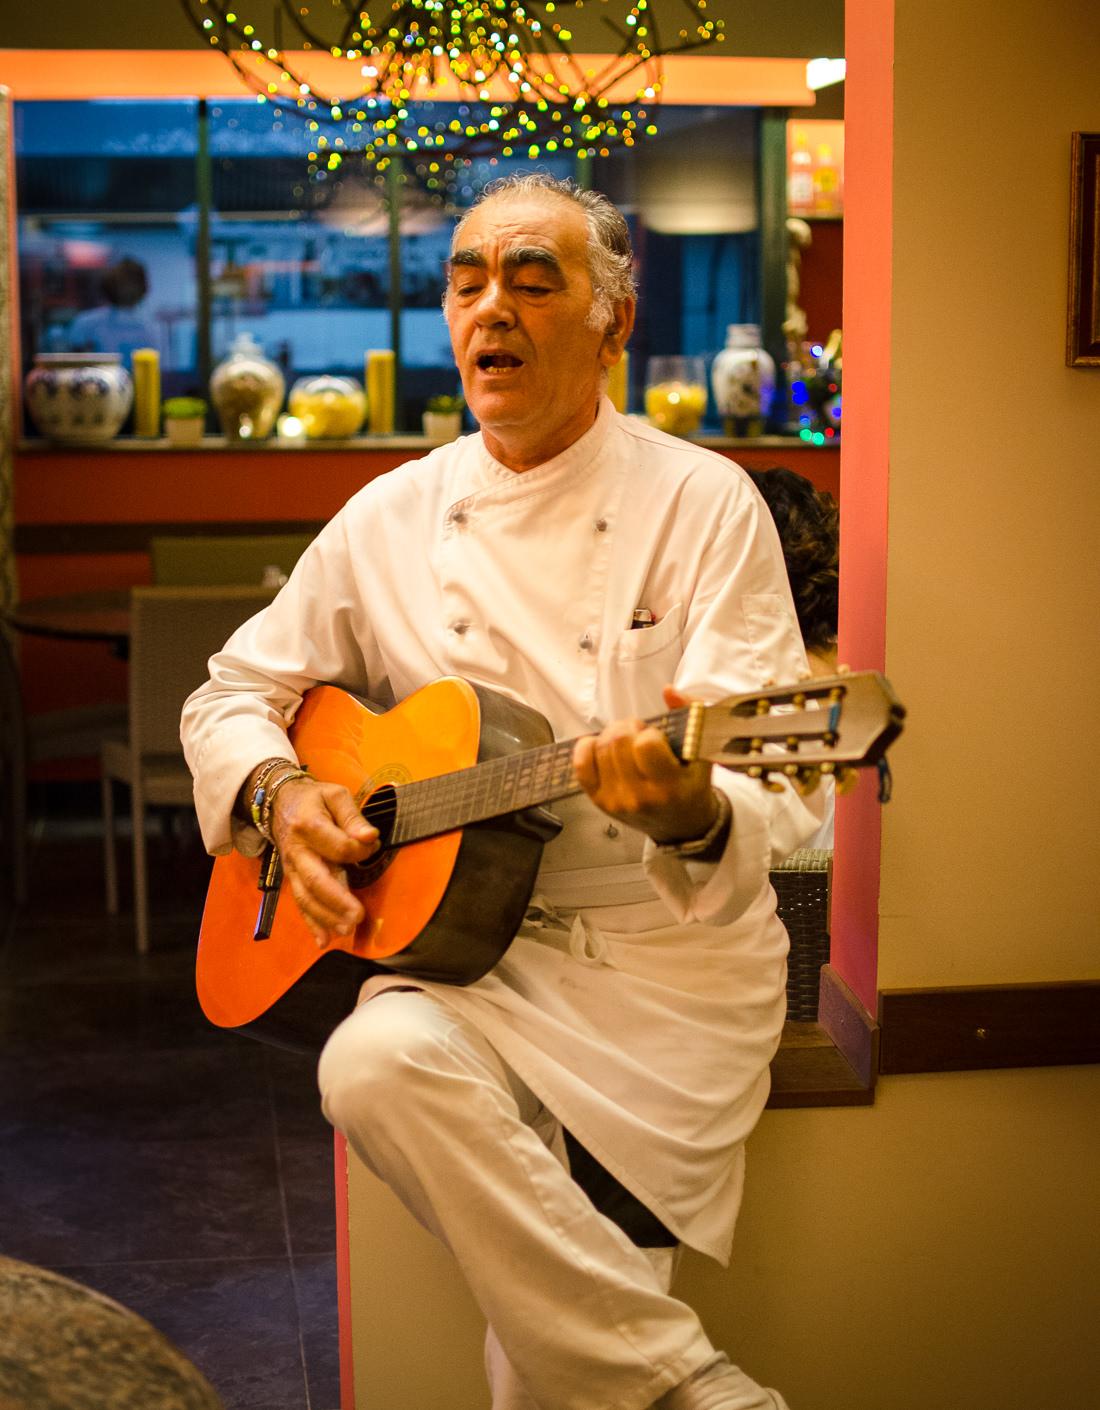 Chef singer